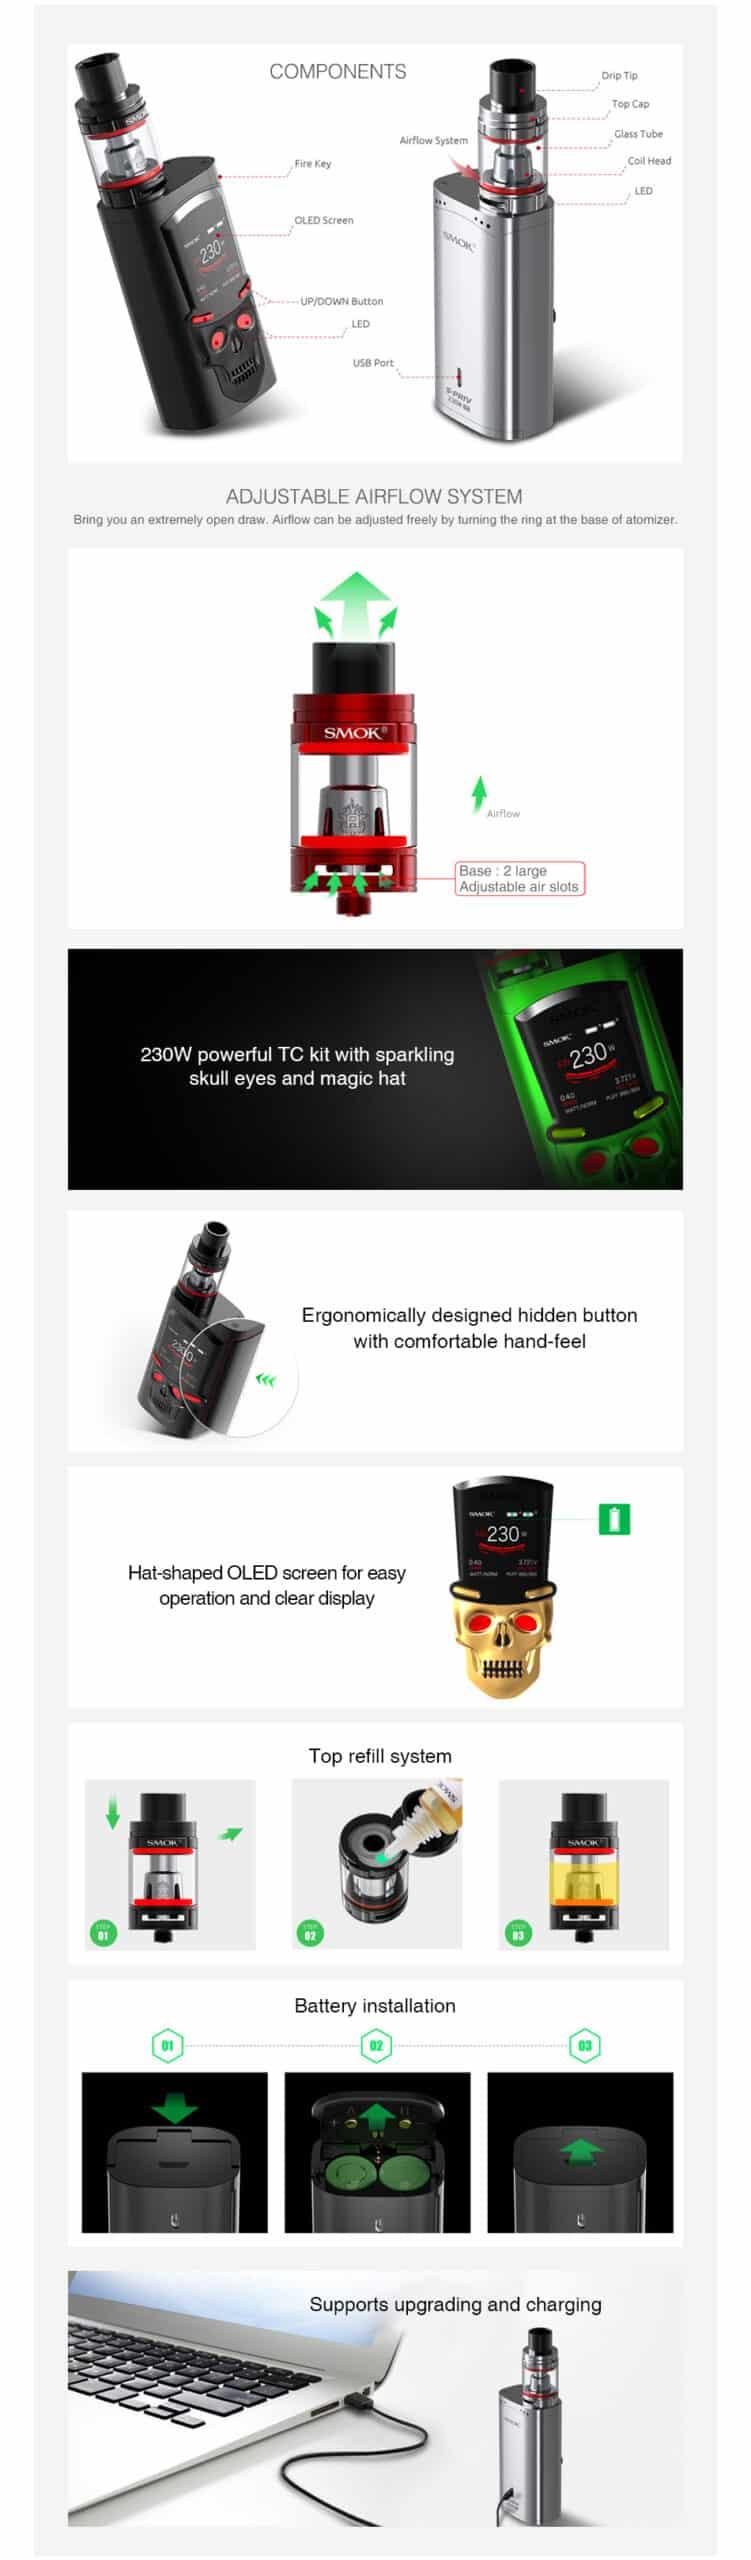 SMOK S Priv 230W TC Kit with TFV8 Big Baby 08 dea897 scaled   E-sigarett, E-juice og Aroma nettbutikk   ECigge.no